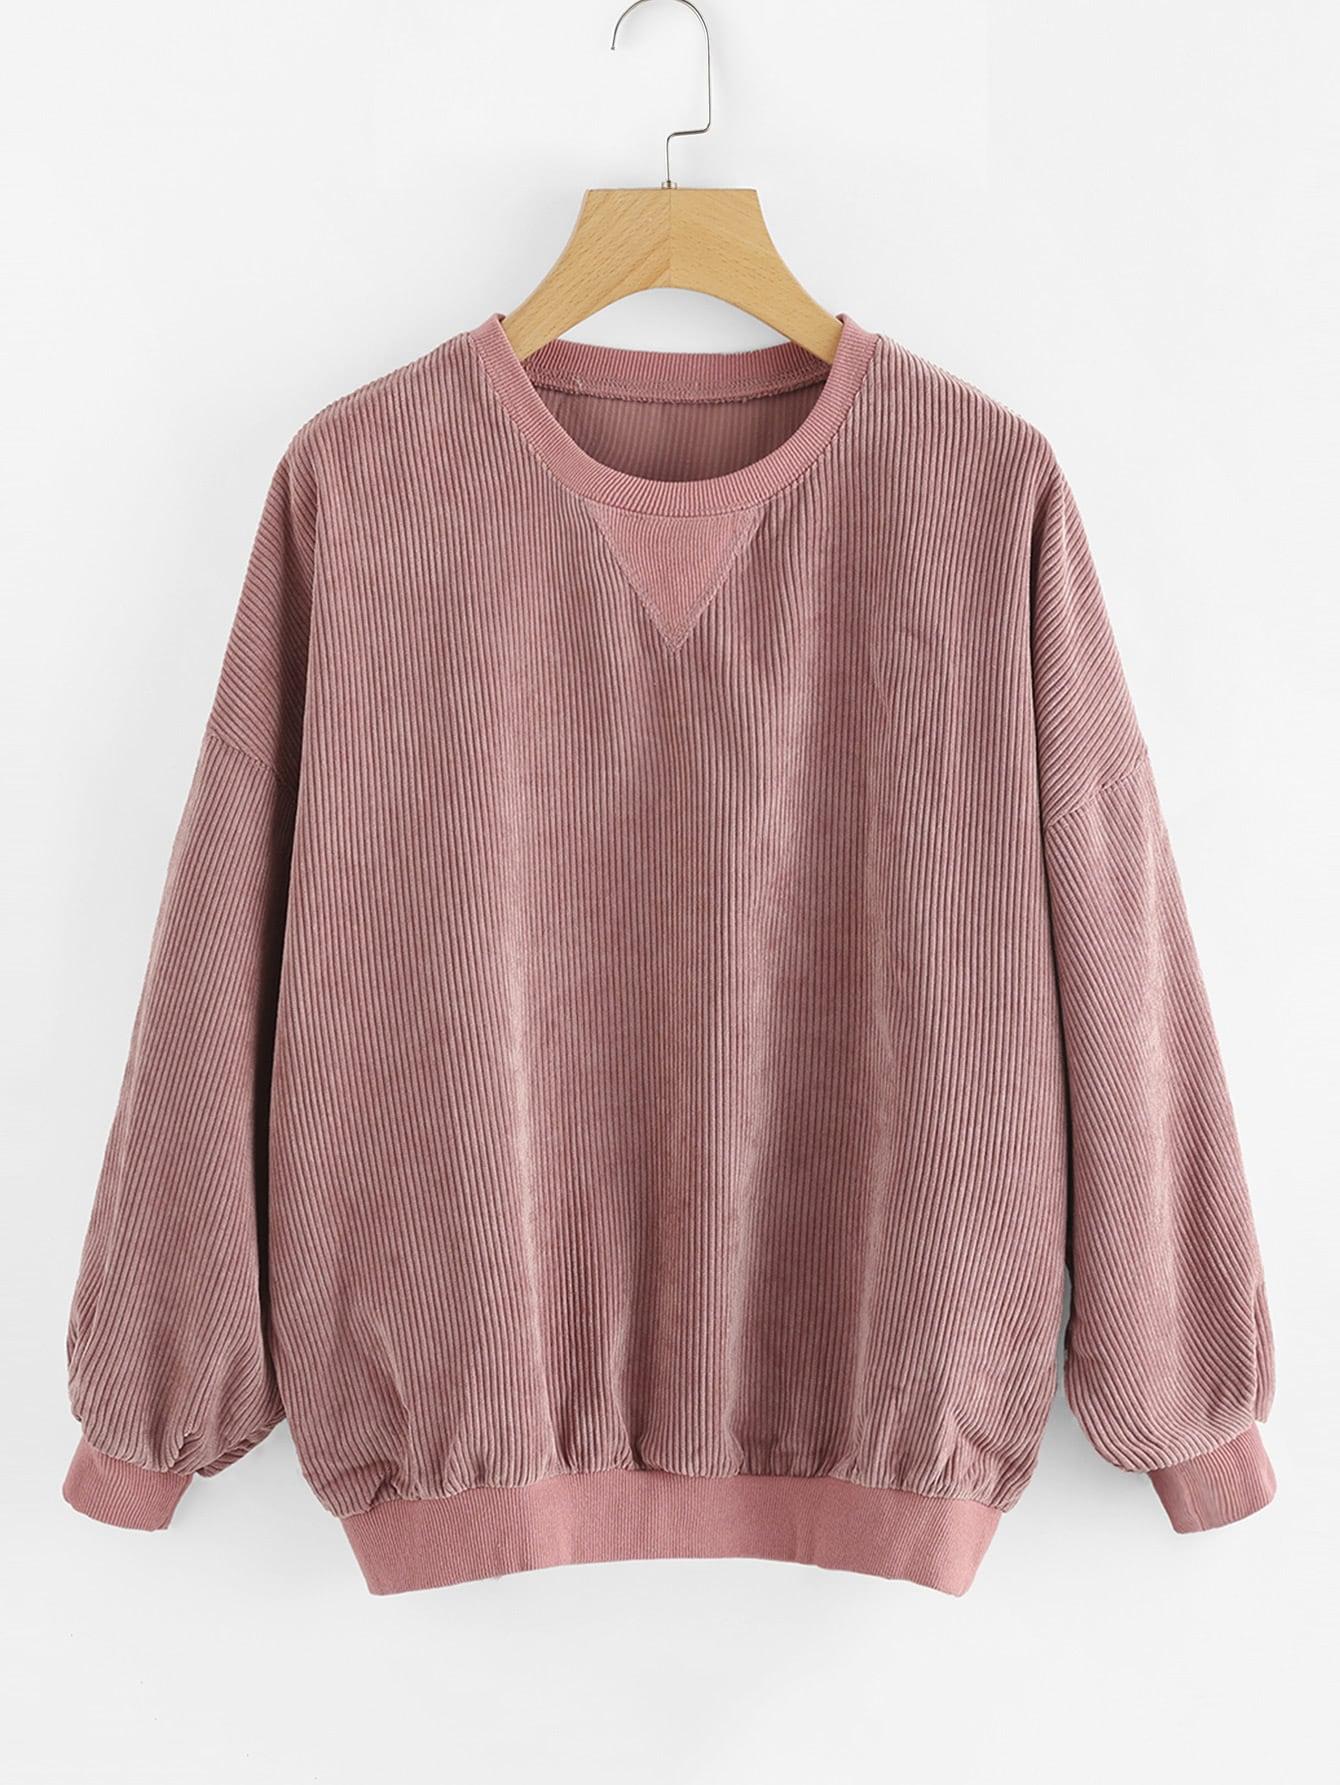 Drop Shoulder Ribbed Sweatshirt sweatsh170927031